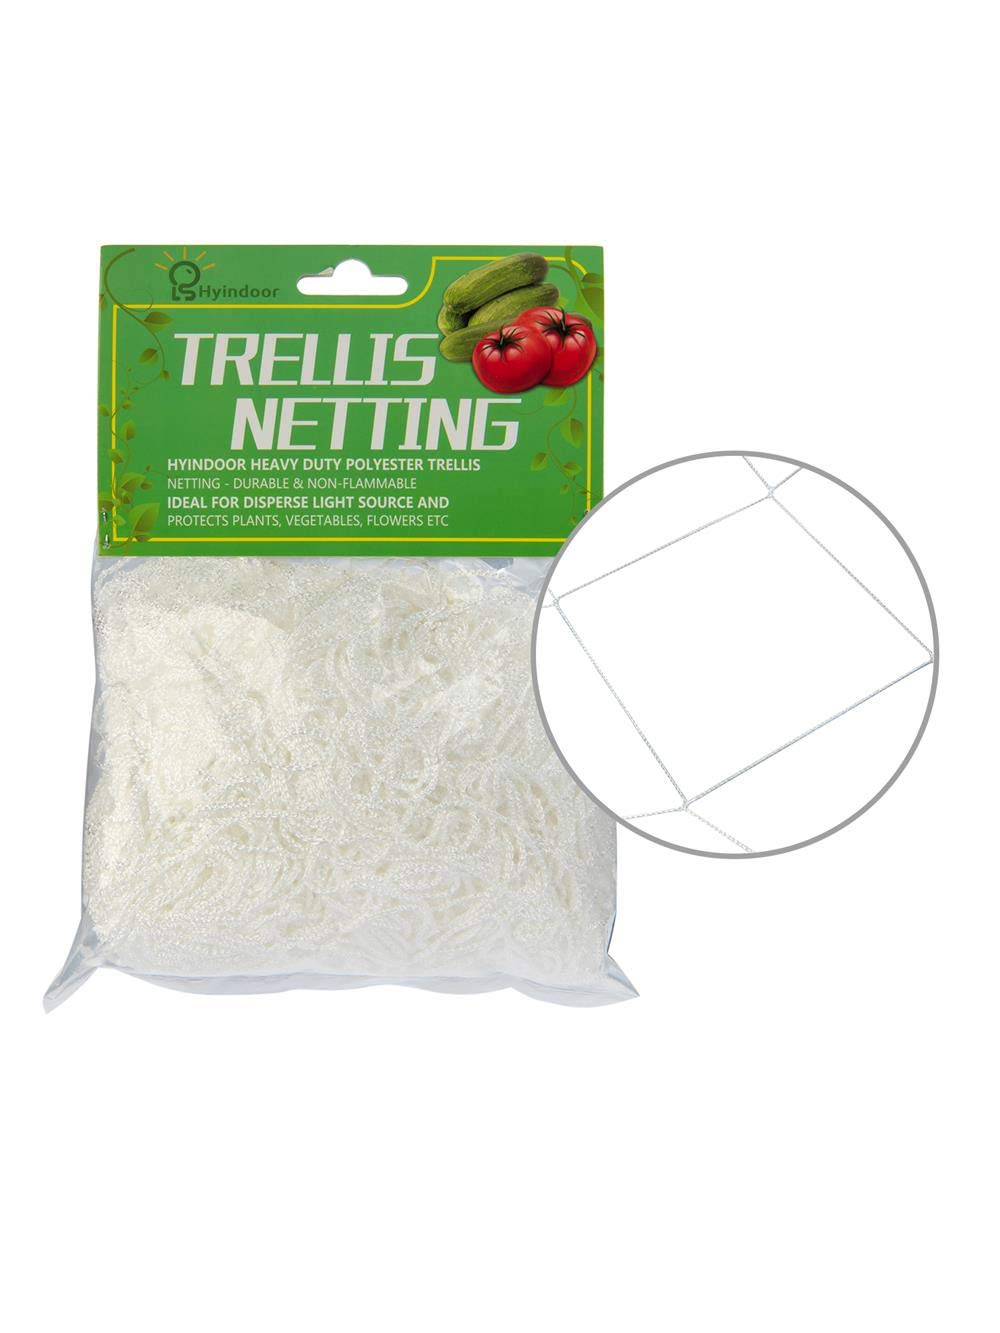 Hyindoor  Grow Tent Trellis Net Garden Polyester Heavy-Duty Plant 6